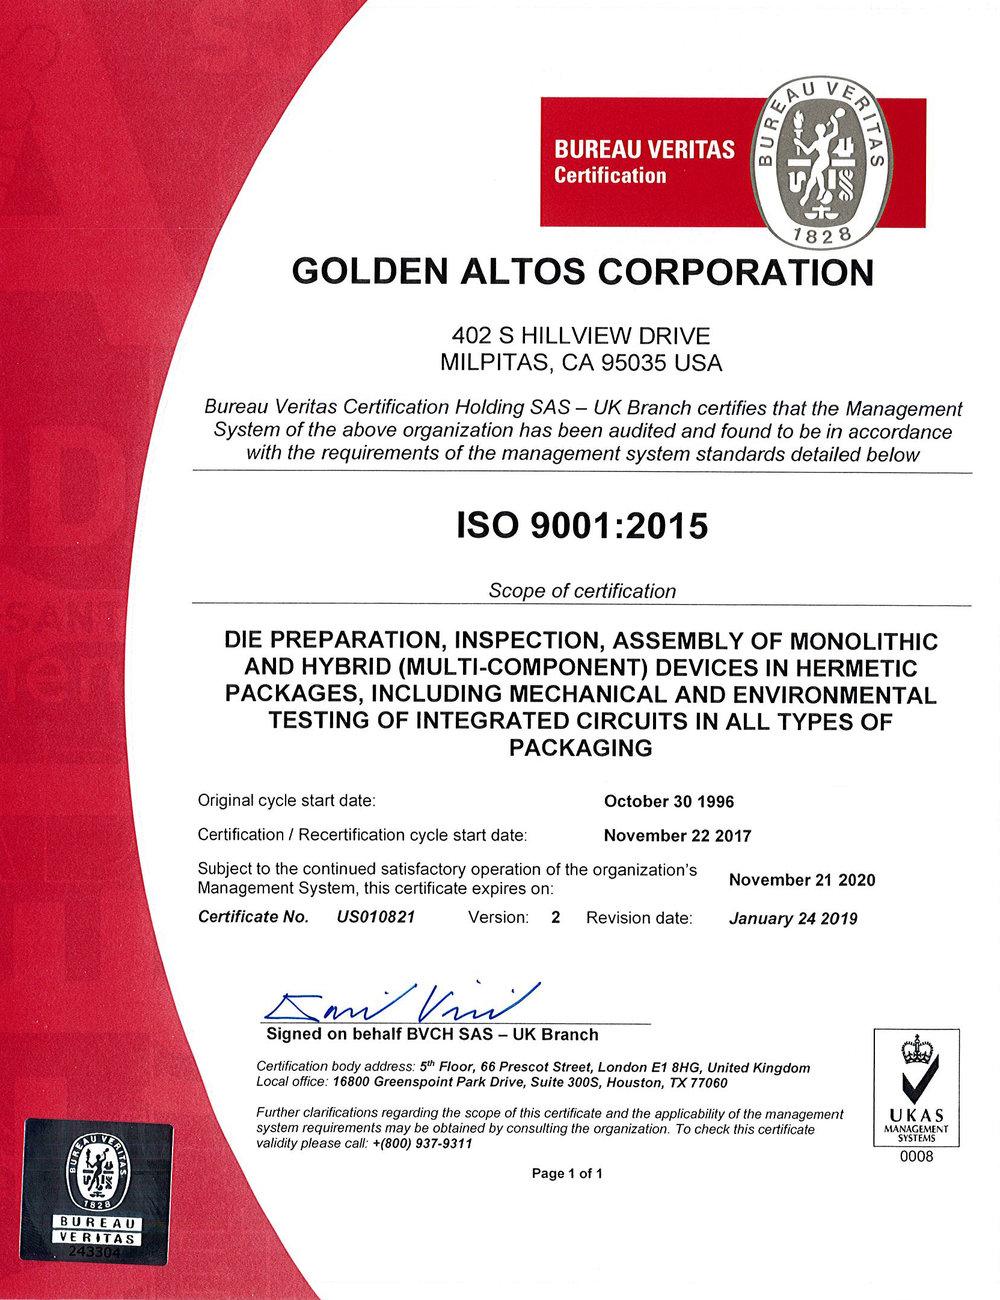 Golden Altos Corporation ISO 90012015 Certificate.jpg